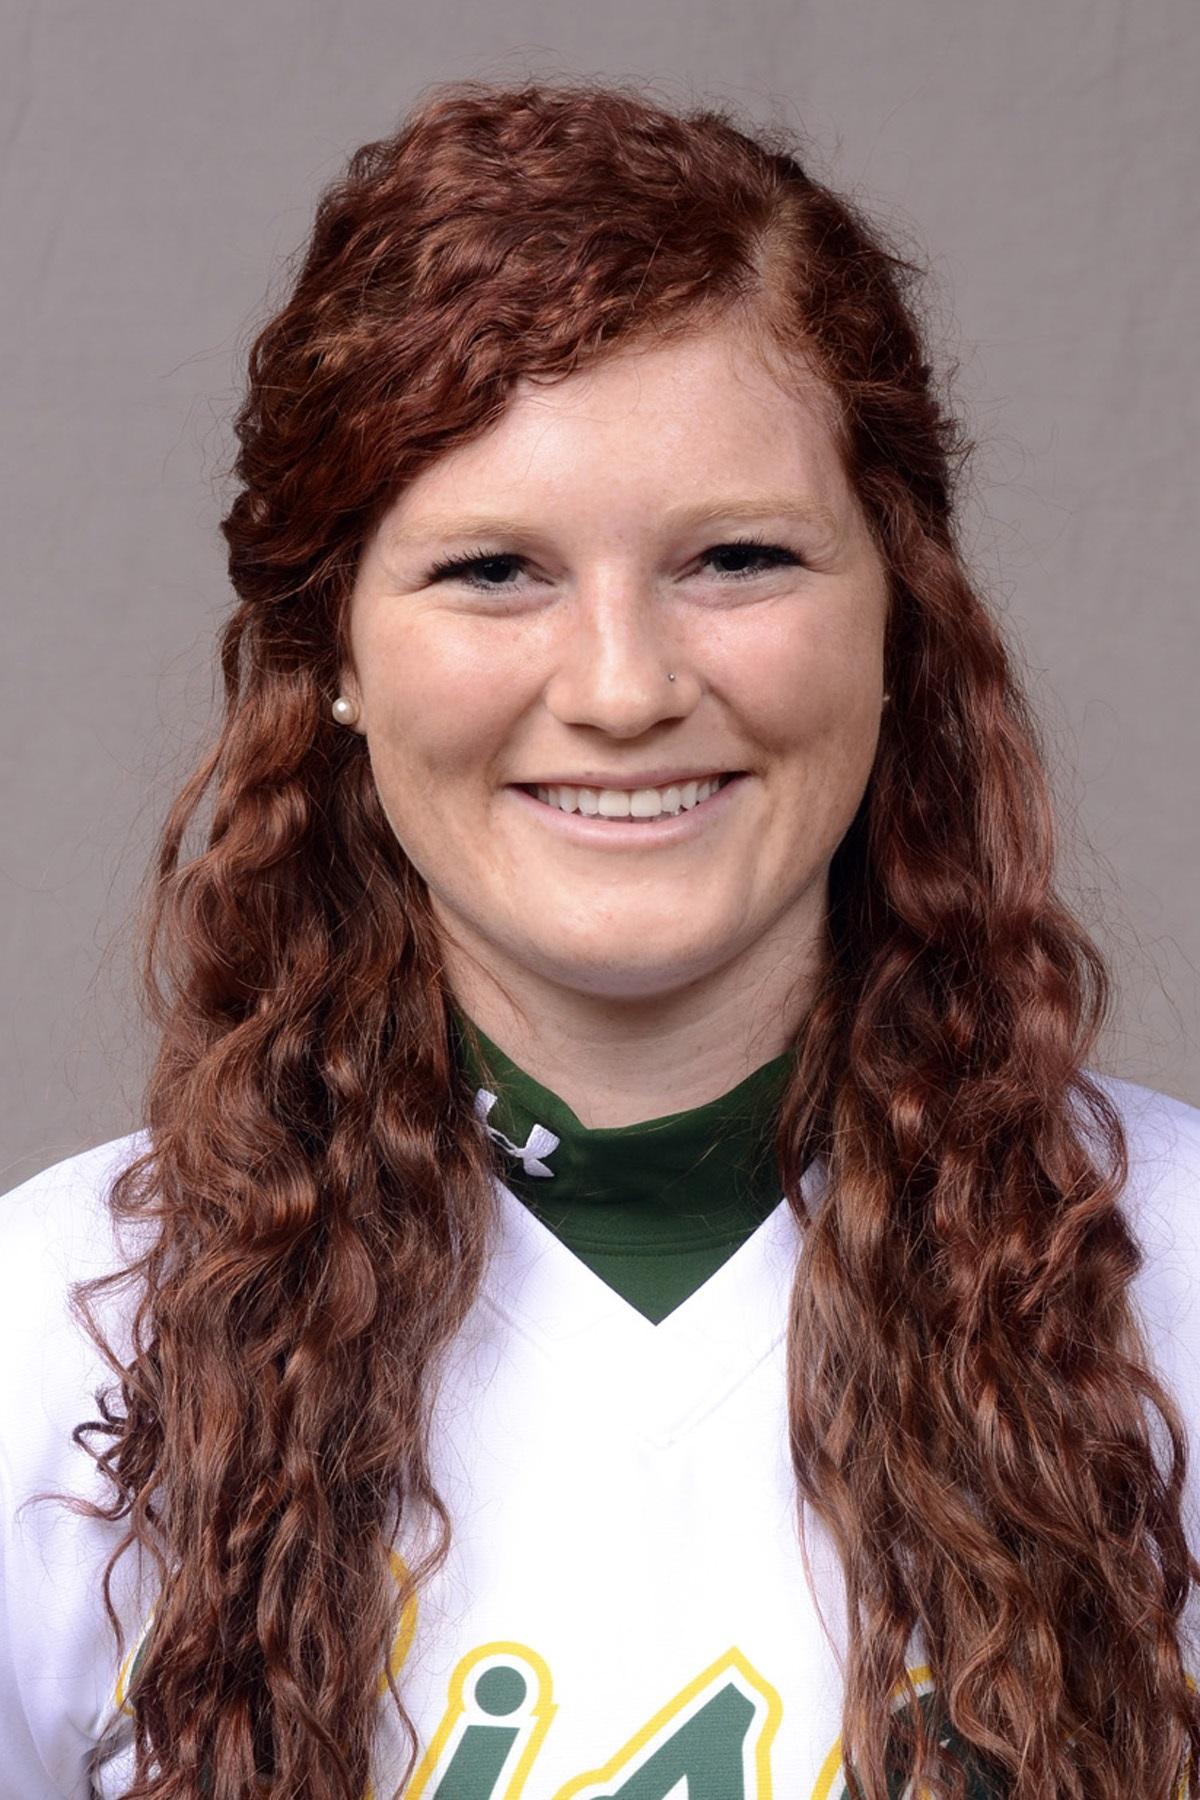 Harvest Bowl Scholarship – Courtney Johnson